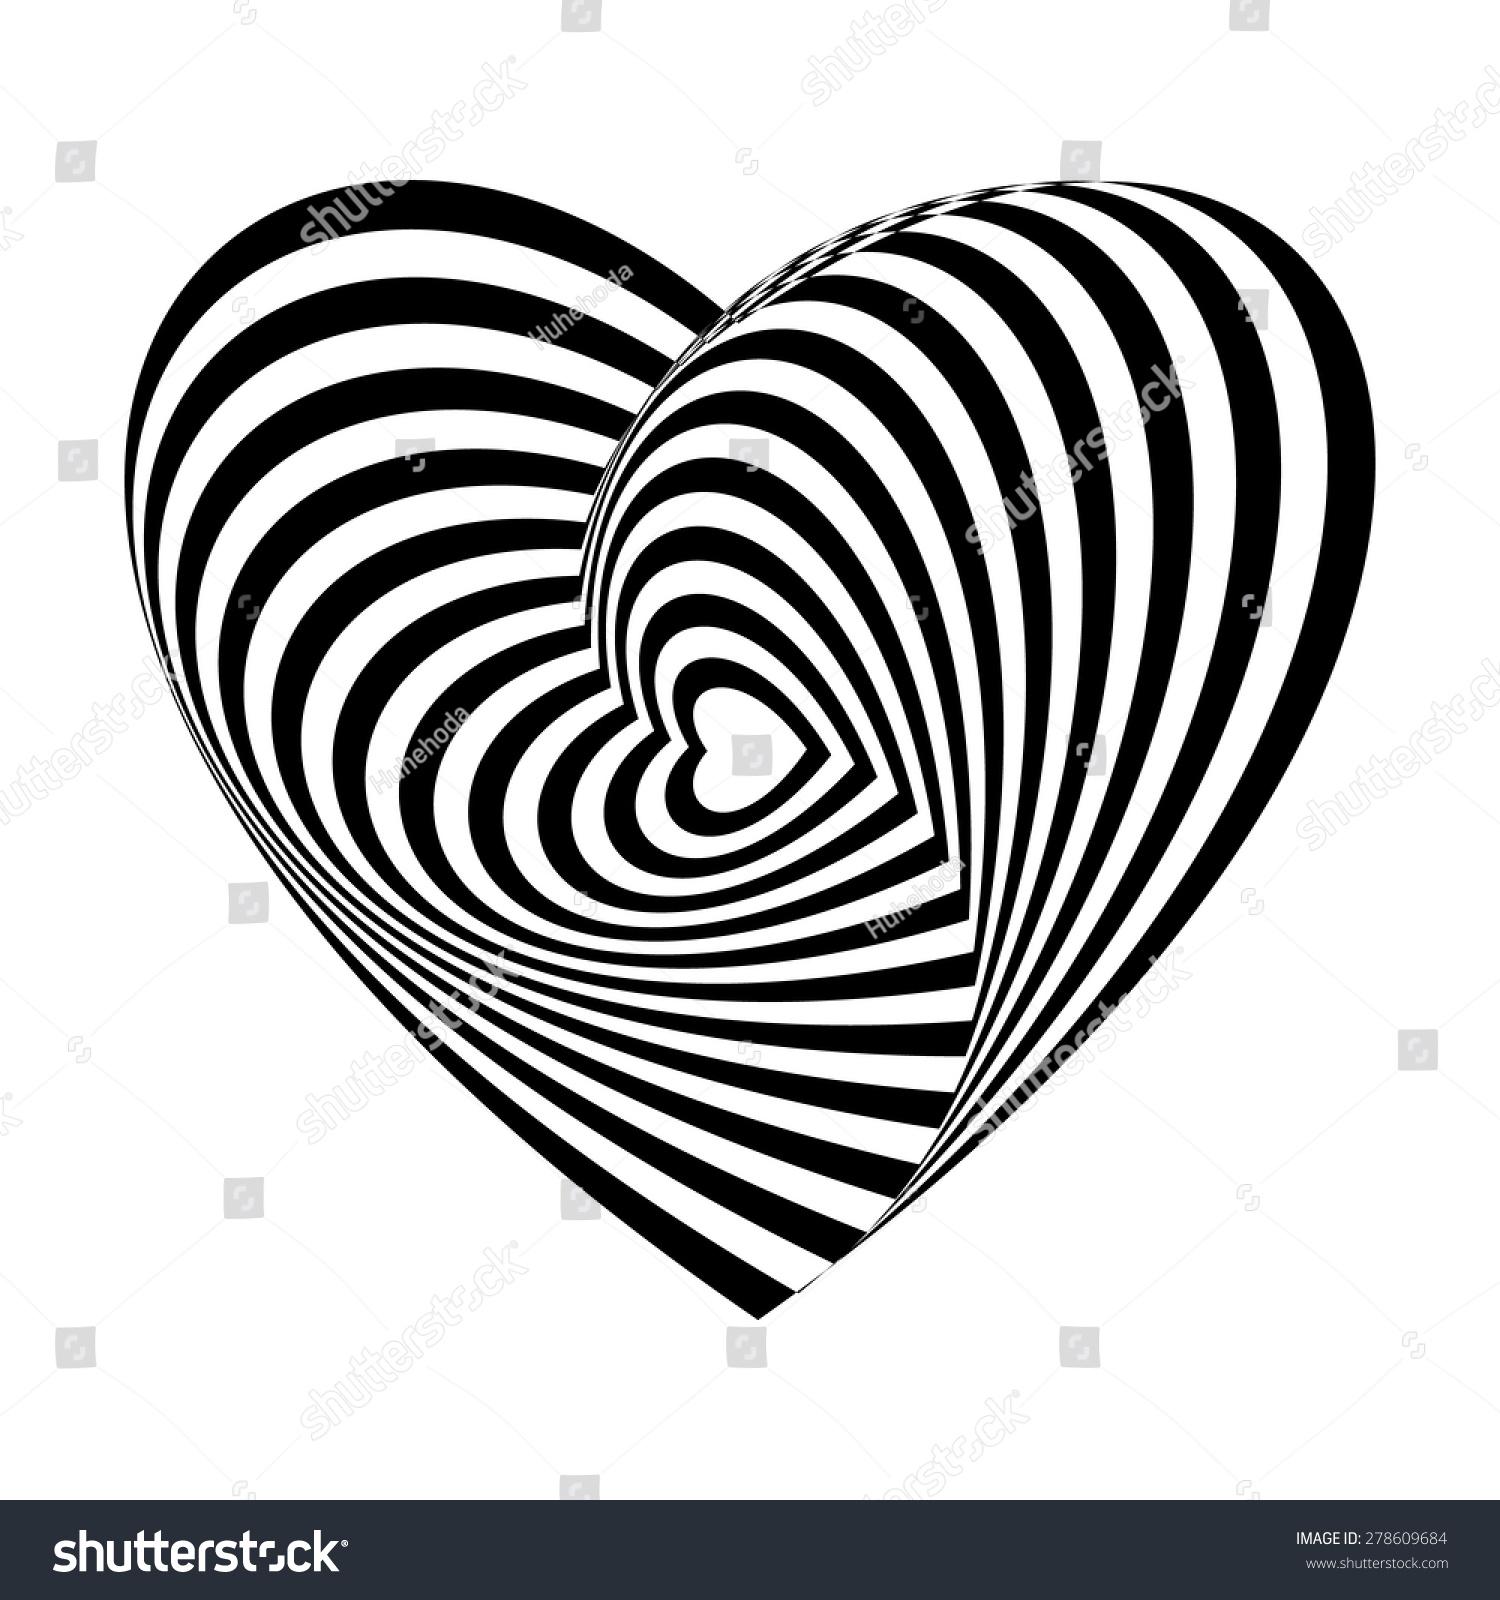 Geometric optical illusion black white heart stock vector for Geometric illusion art